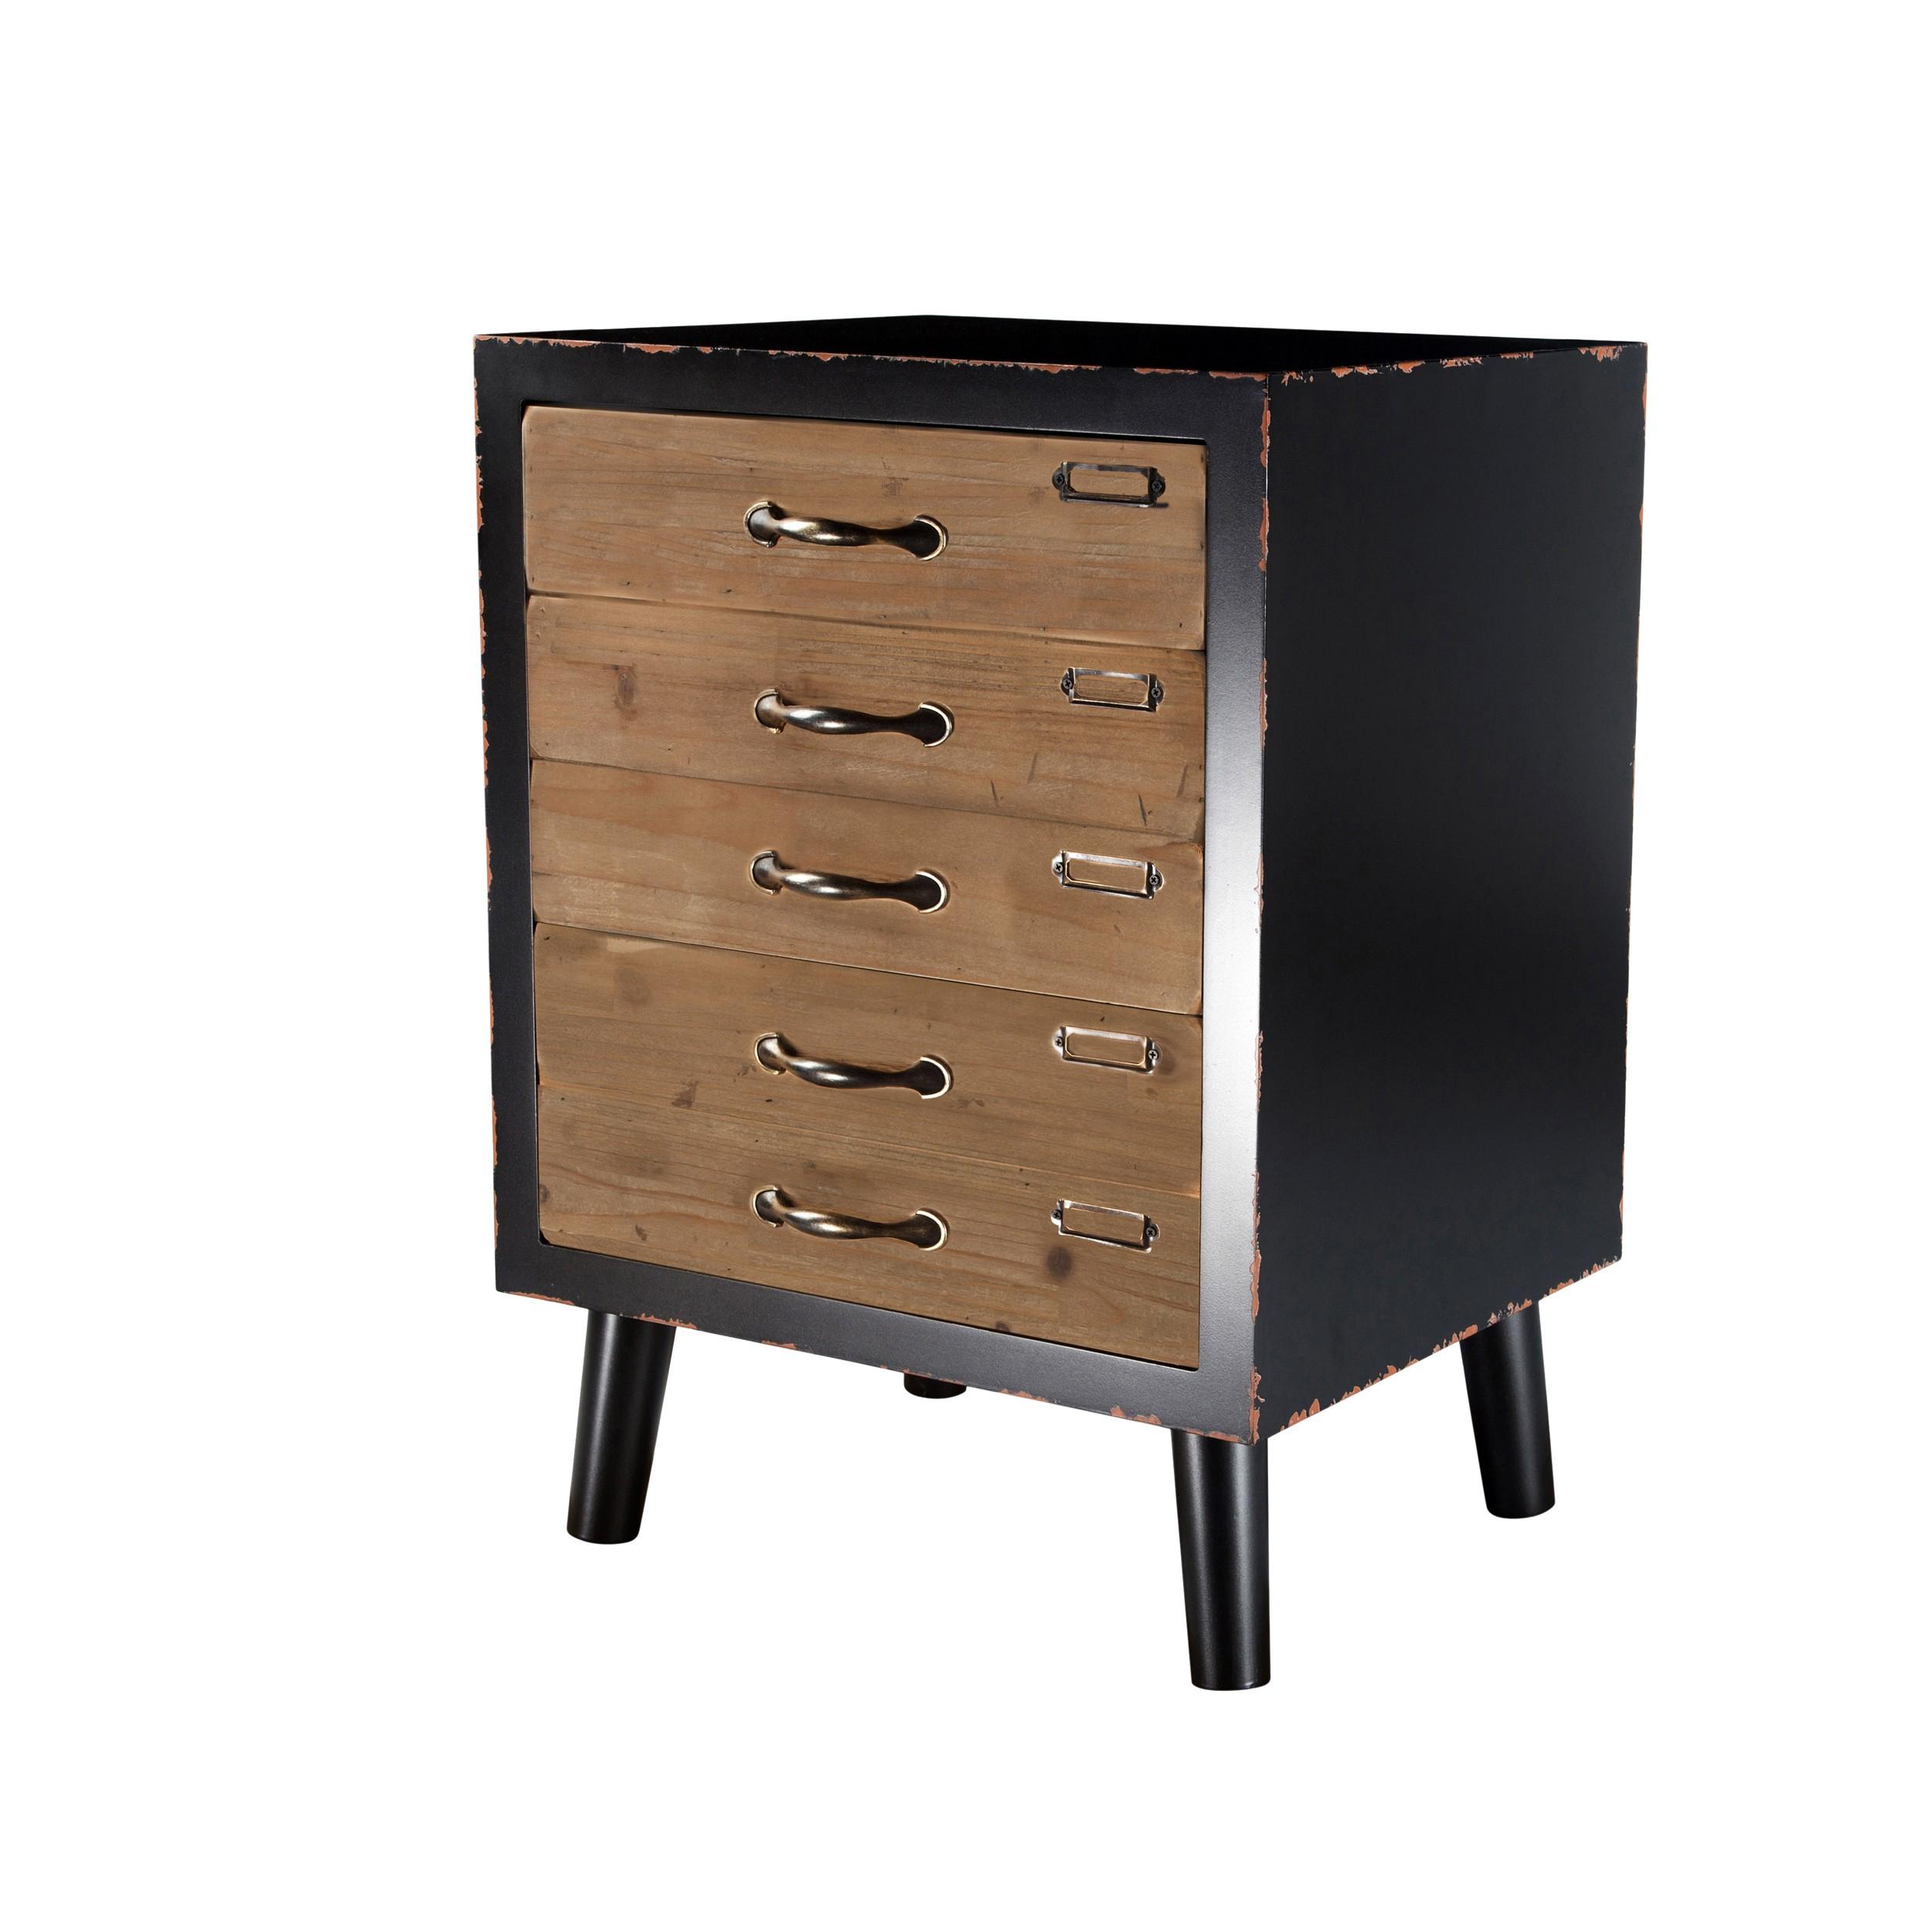 chevet lohja 3 tiroirs commandez nos chevets lohja 3 tiroirs rdv d co. Black Bedroom Furniture Sets. Home Design Ideas